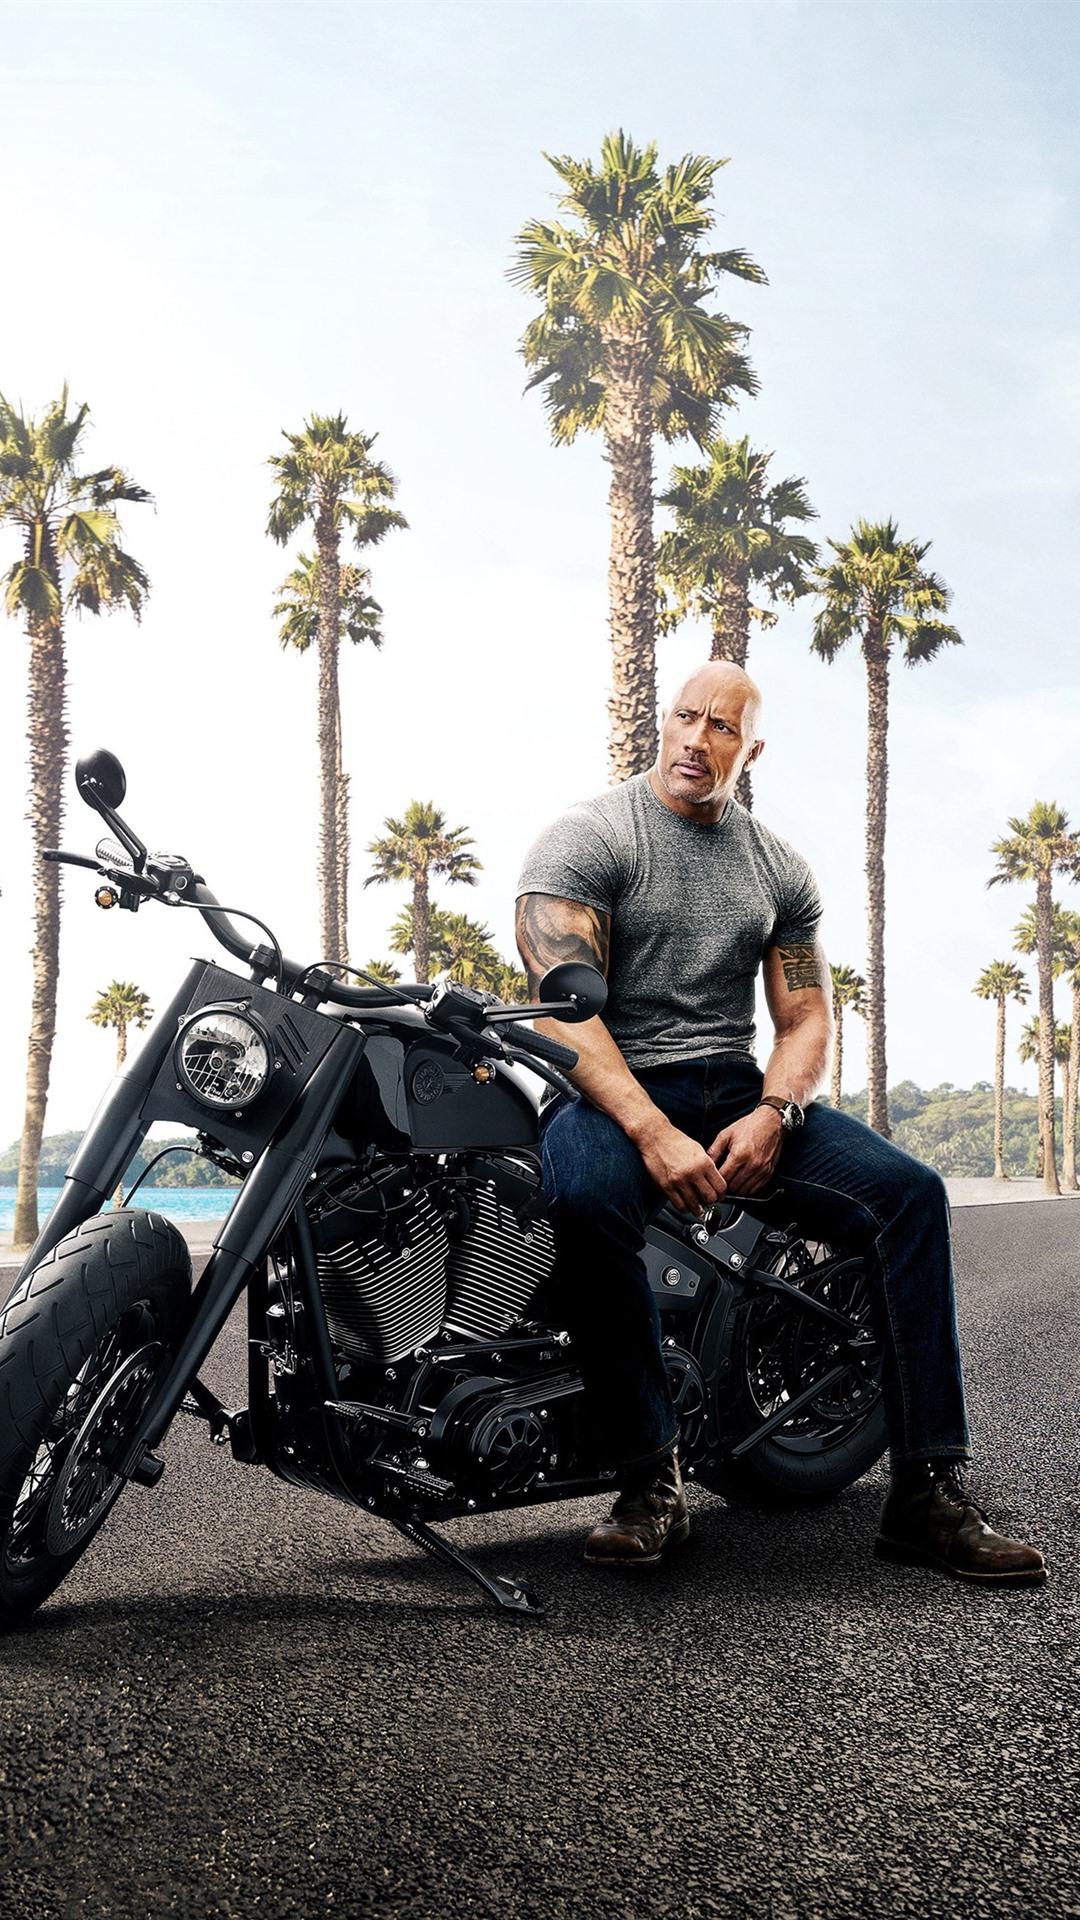 Dwayne Johnson Jason Statham Fast And Furious 8 1080x1920 Iphone